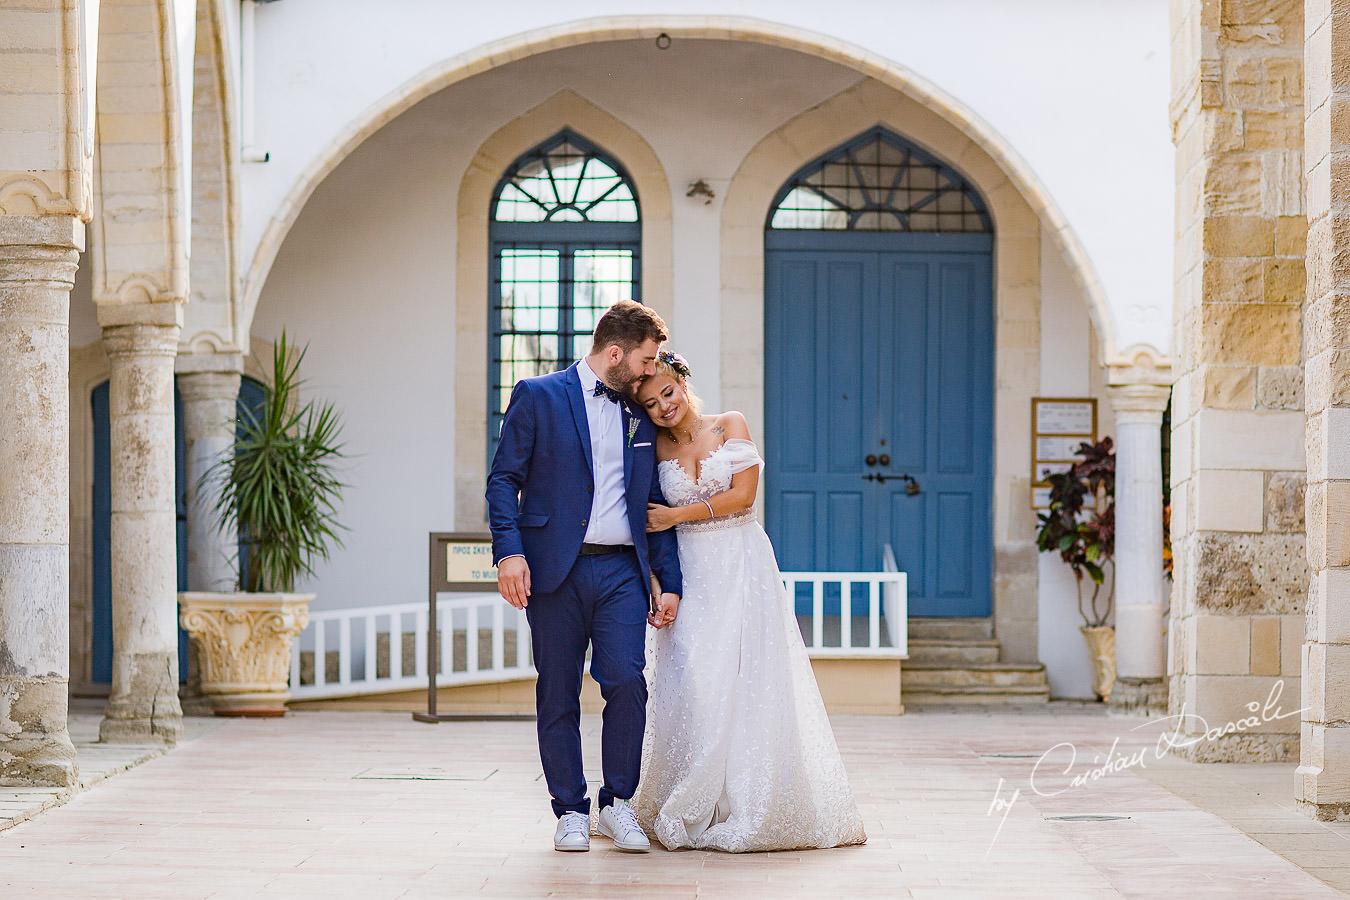 Wedding Photography at Lebay Hotel in Larnaca by Cyprus Wedding Photographer Cristian Dascalu.